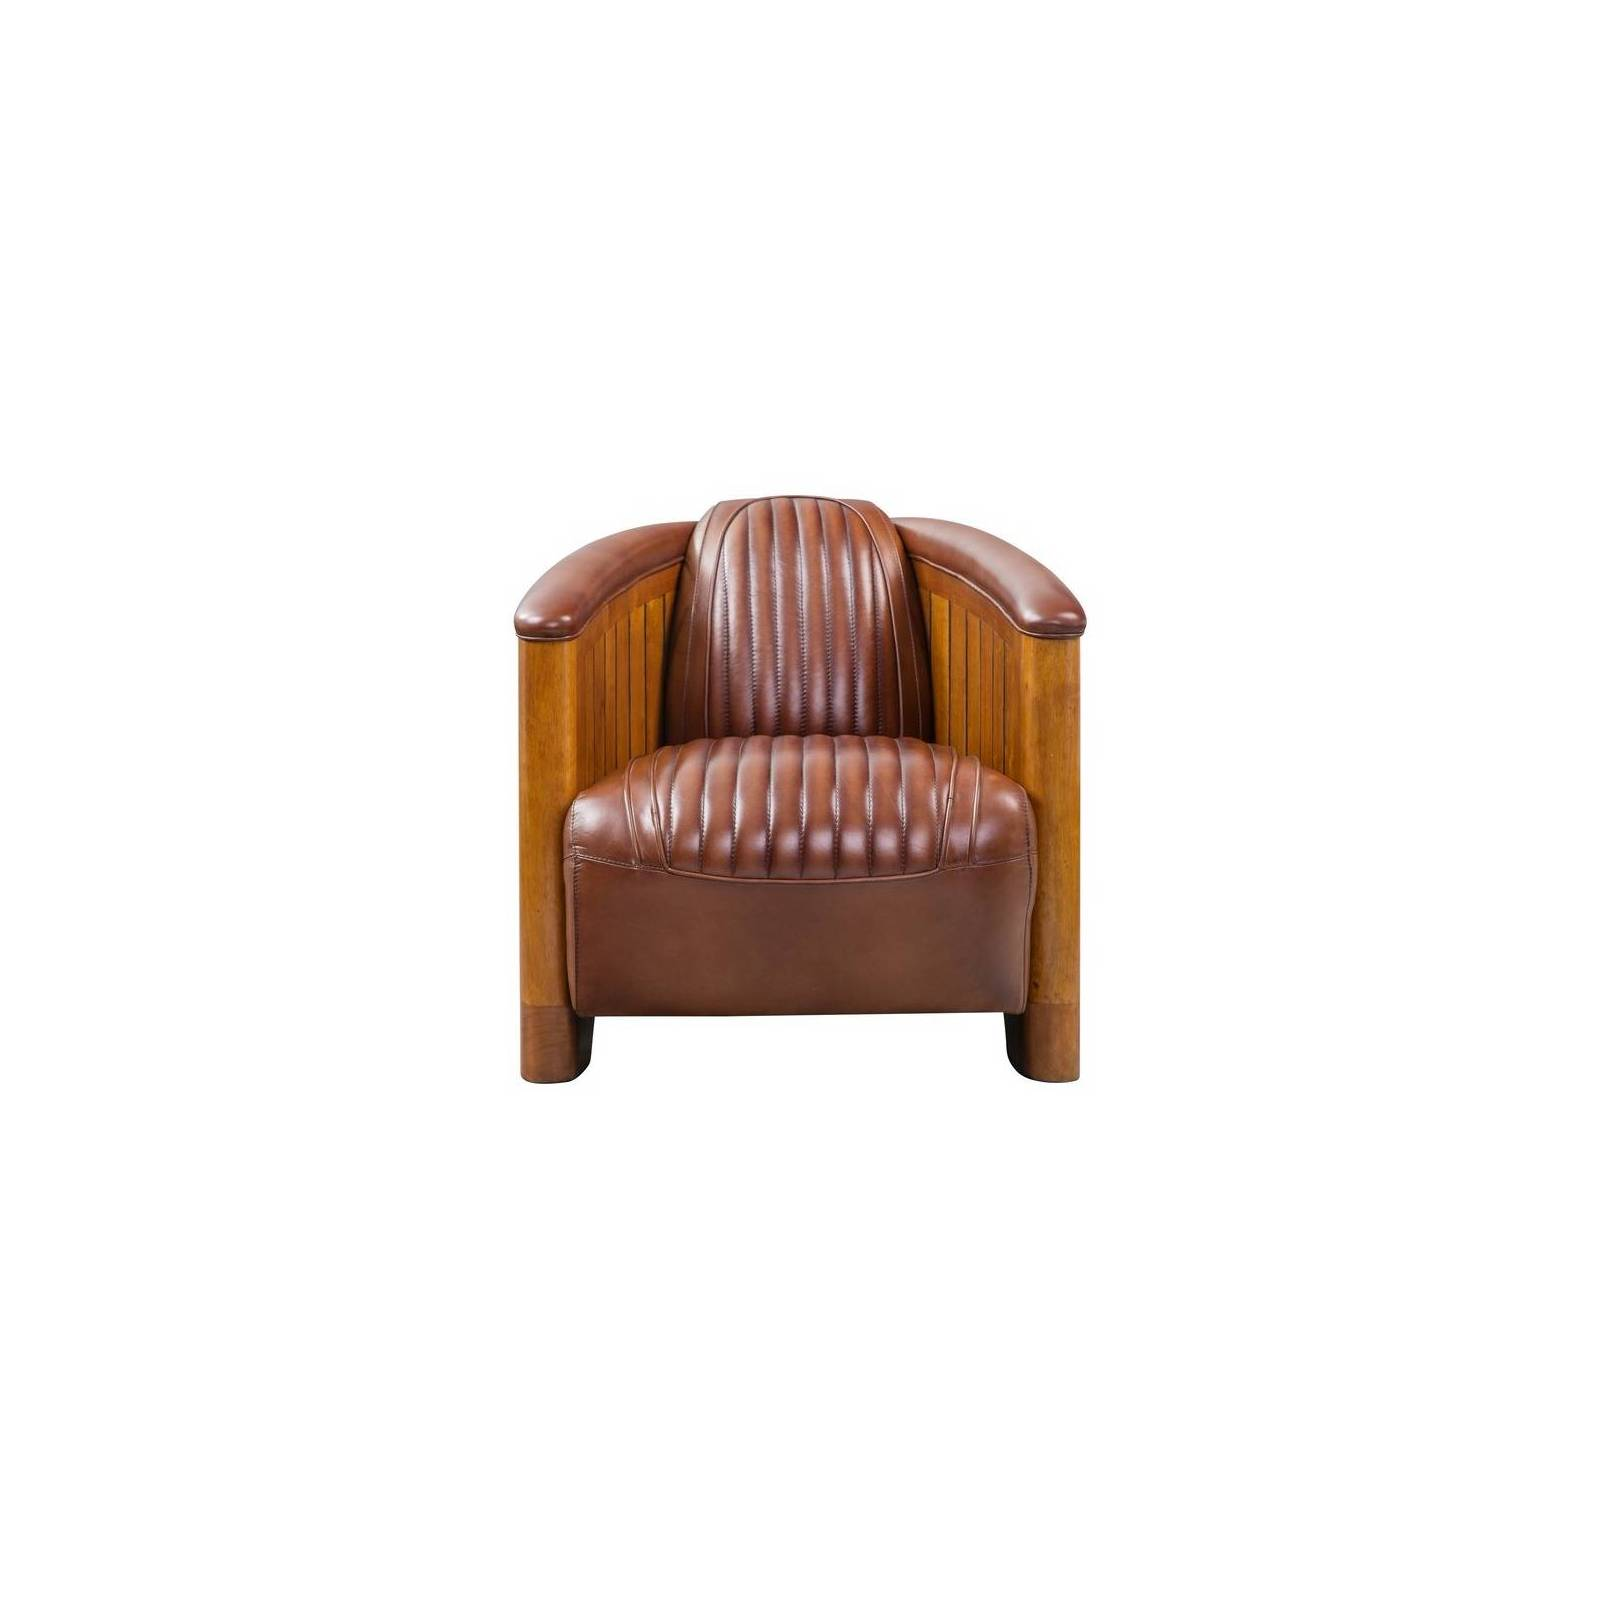 Fauteuil Club CANOE, cuir vintage Mobilier Club Vintage - 19